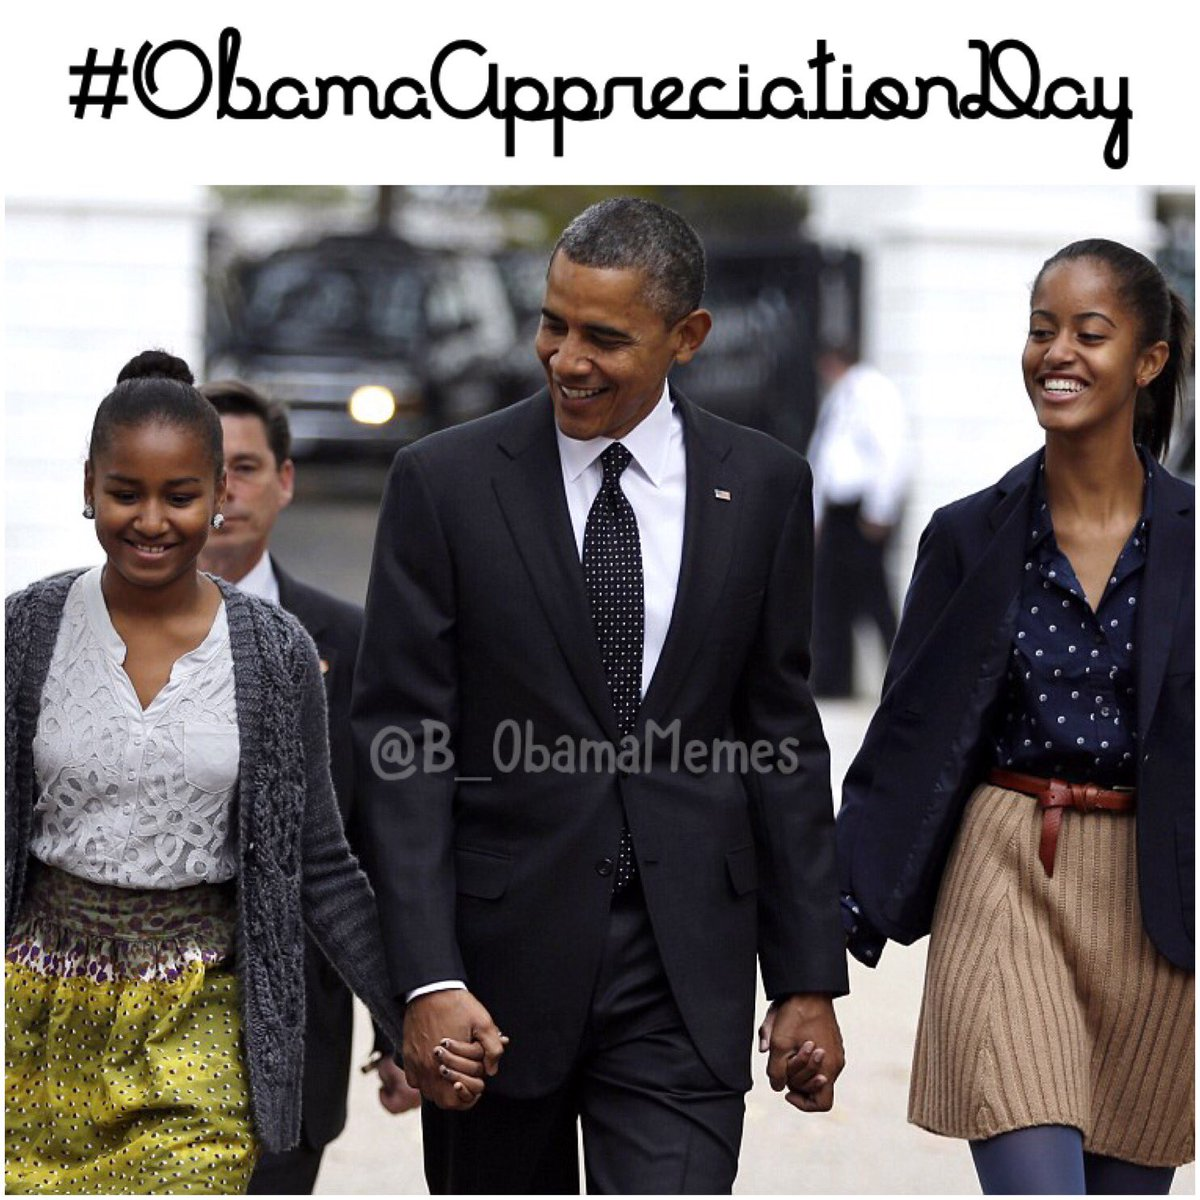 B Obamamemes